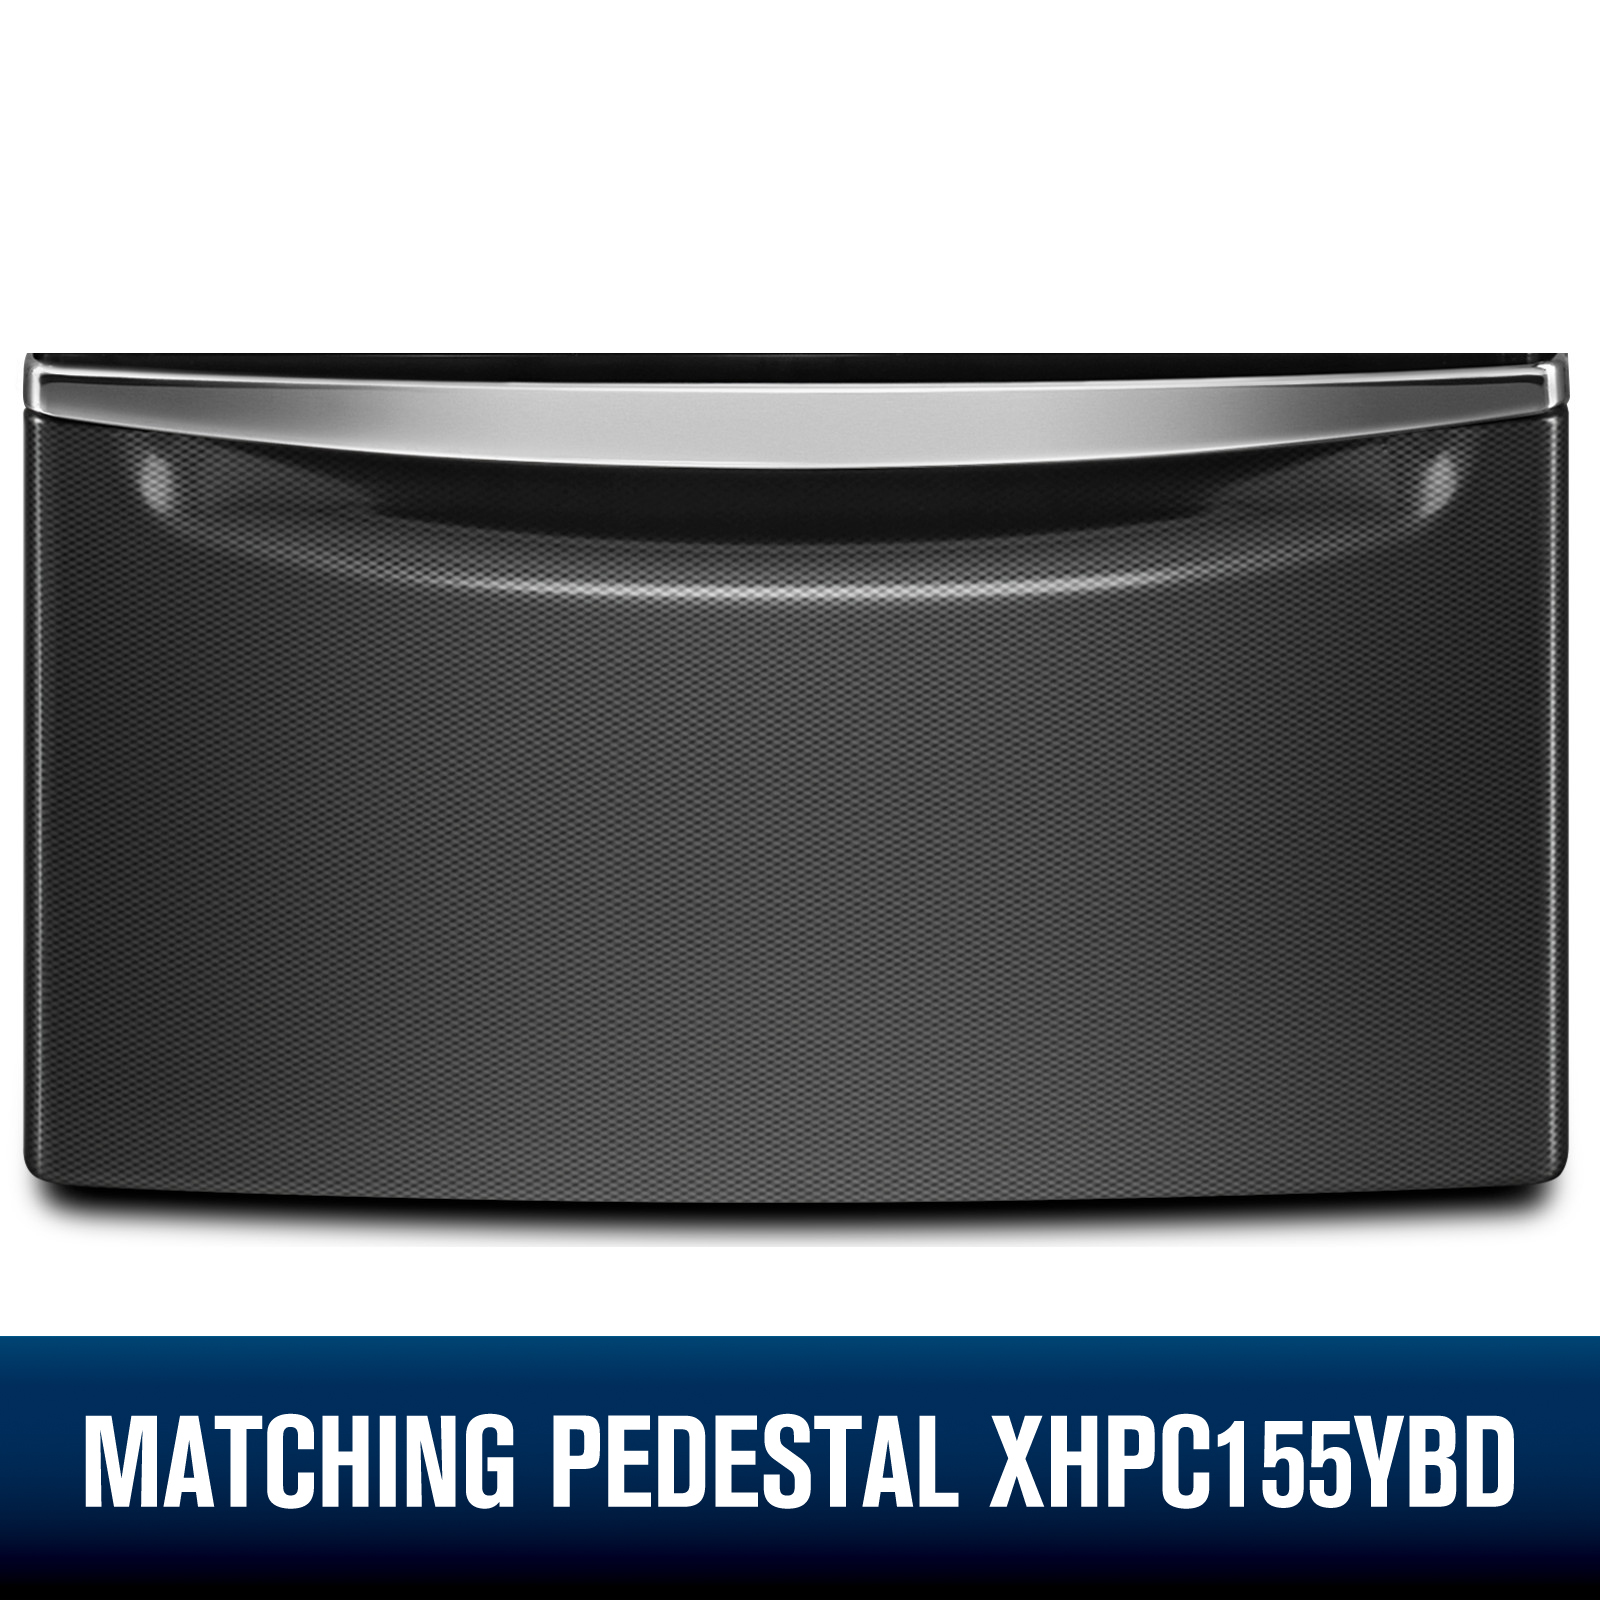 Whirlpool WFW92HEFBD 4.5 cu. ft. Front Load Washer w/ Load & Go™ Bulk Dispenser - Black Diamond